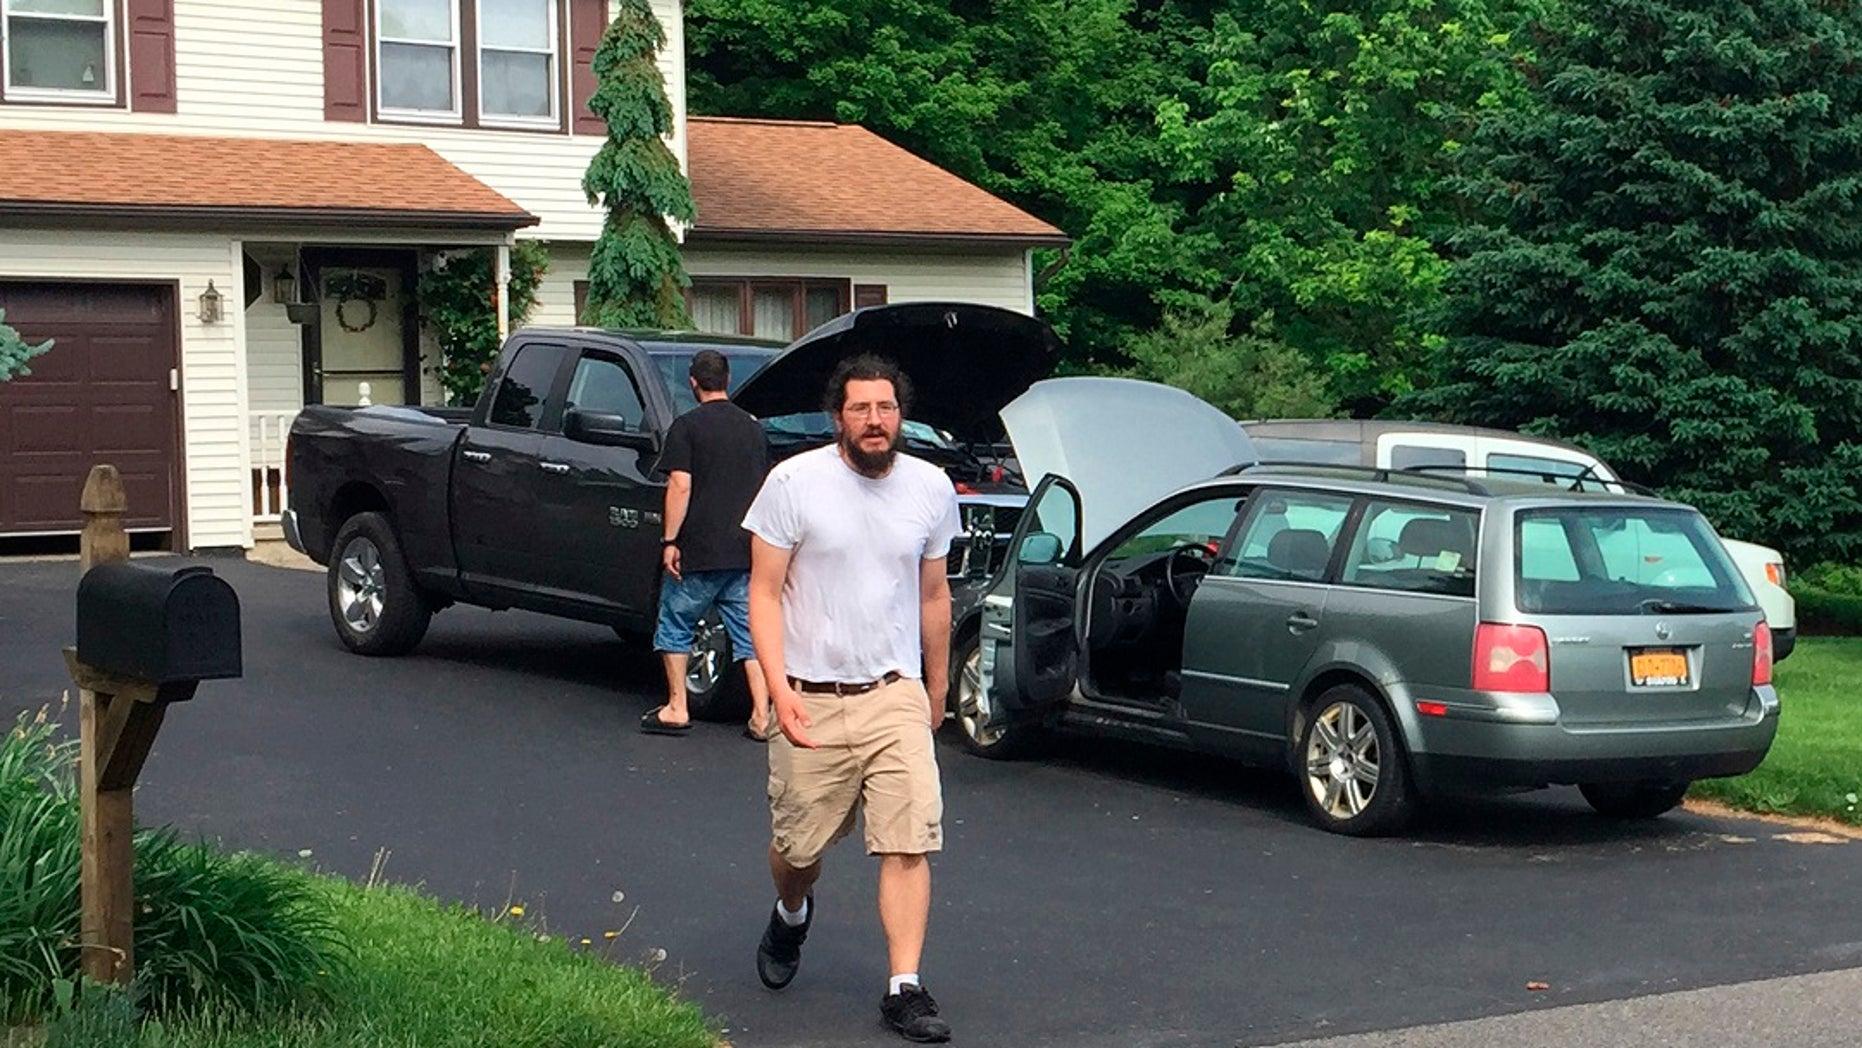 June 1, 2018: Michael Rotondo, 30, prepares to leave his parents' house in Camillus, N.Y.